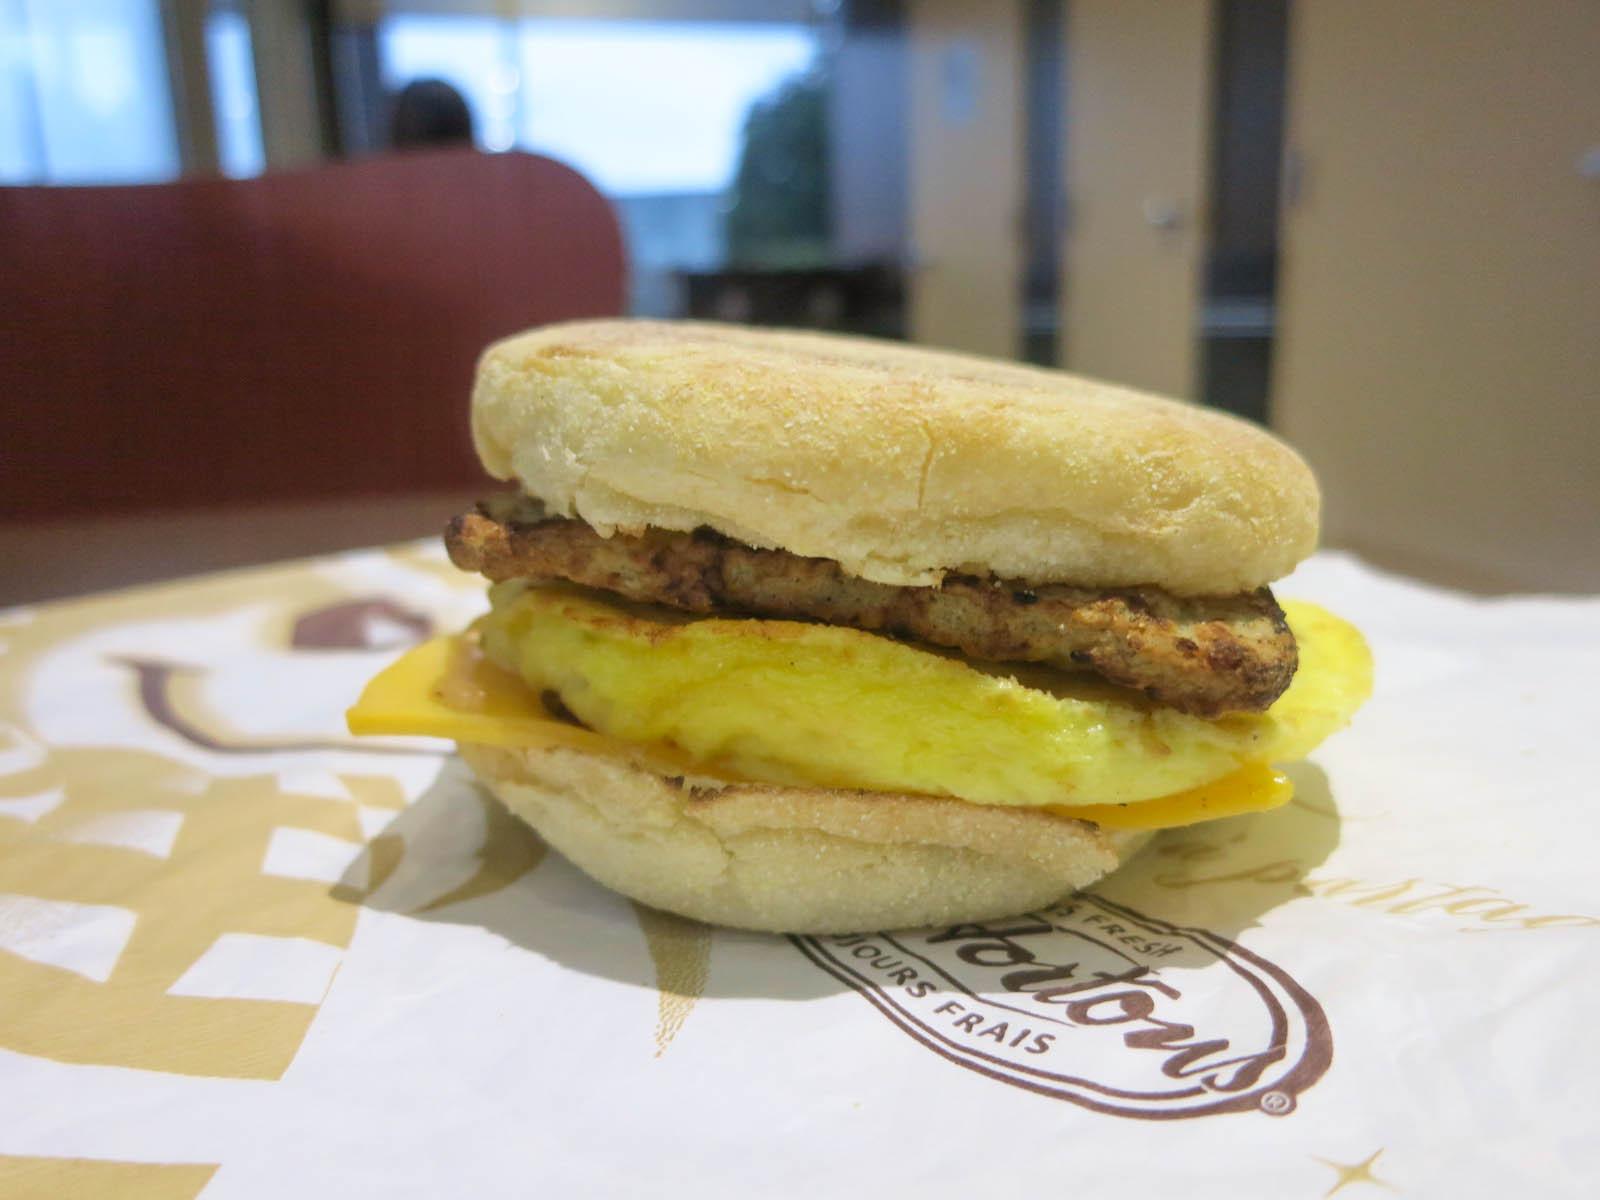 Tim Hortons Healthy Breakfast  Tim Hortons Turkey Sausage Breakfast Sandwich